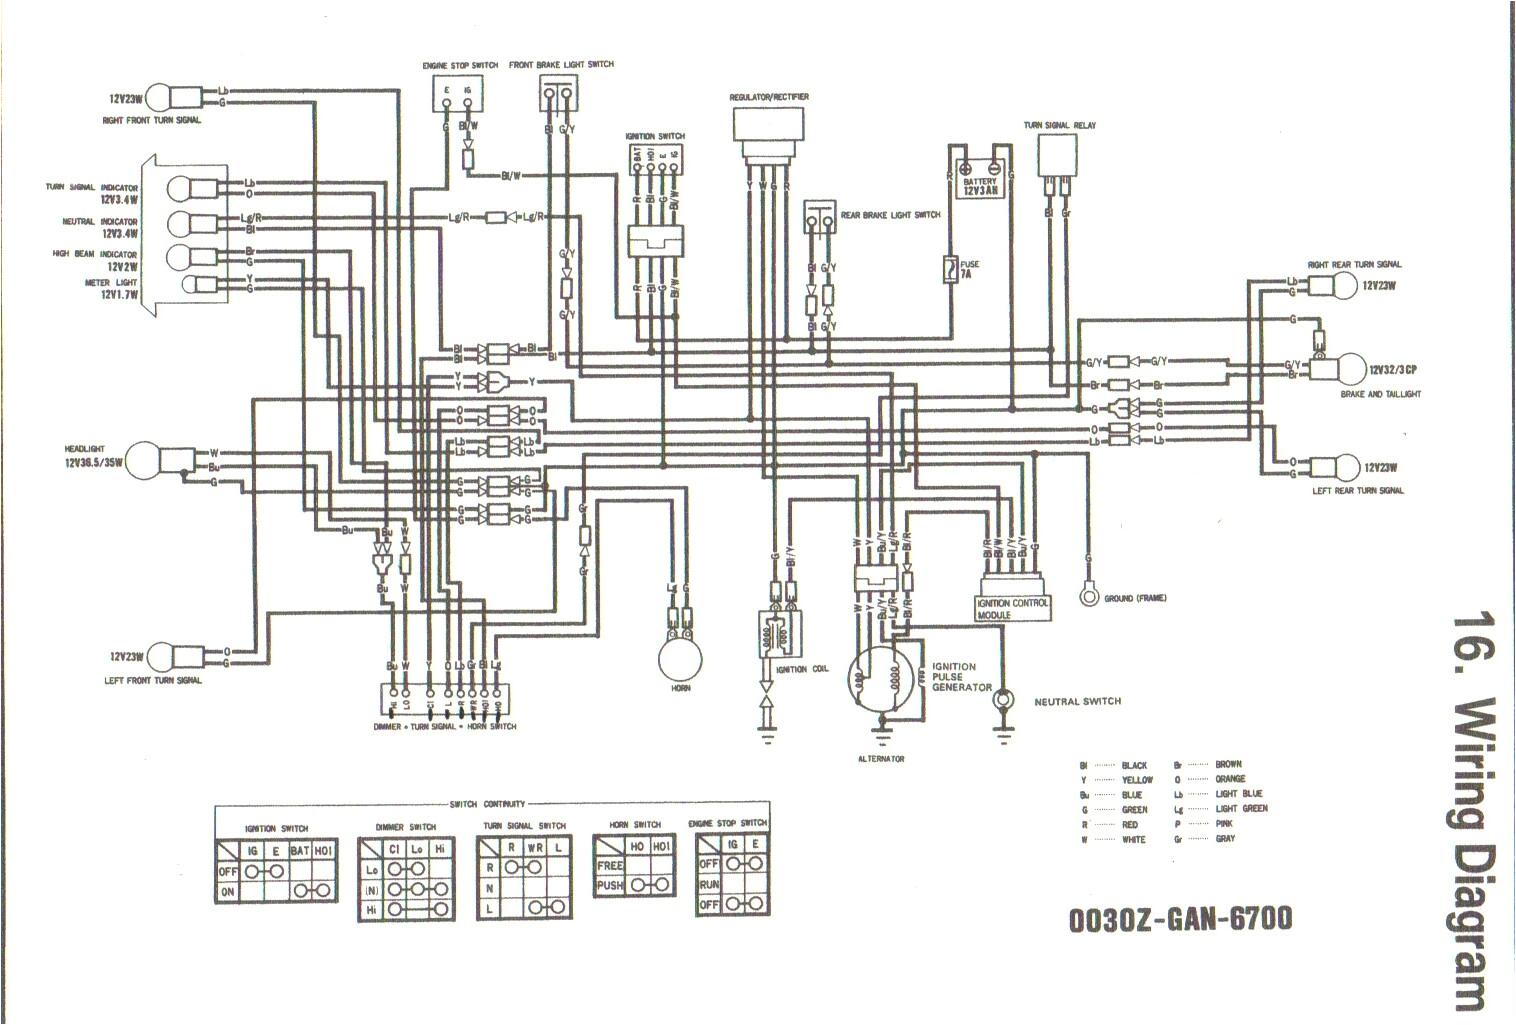 na50 wiring diagram wiring diagram autovehiclena50 wiring diagram wiring diagram for youwrg 9829 ct110 wiring